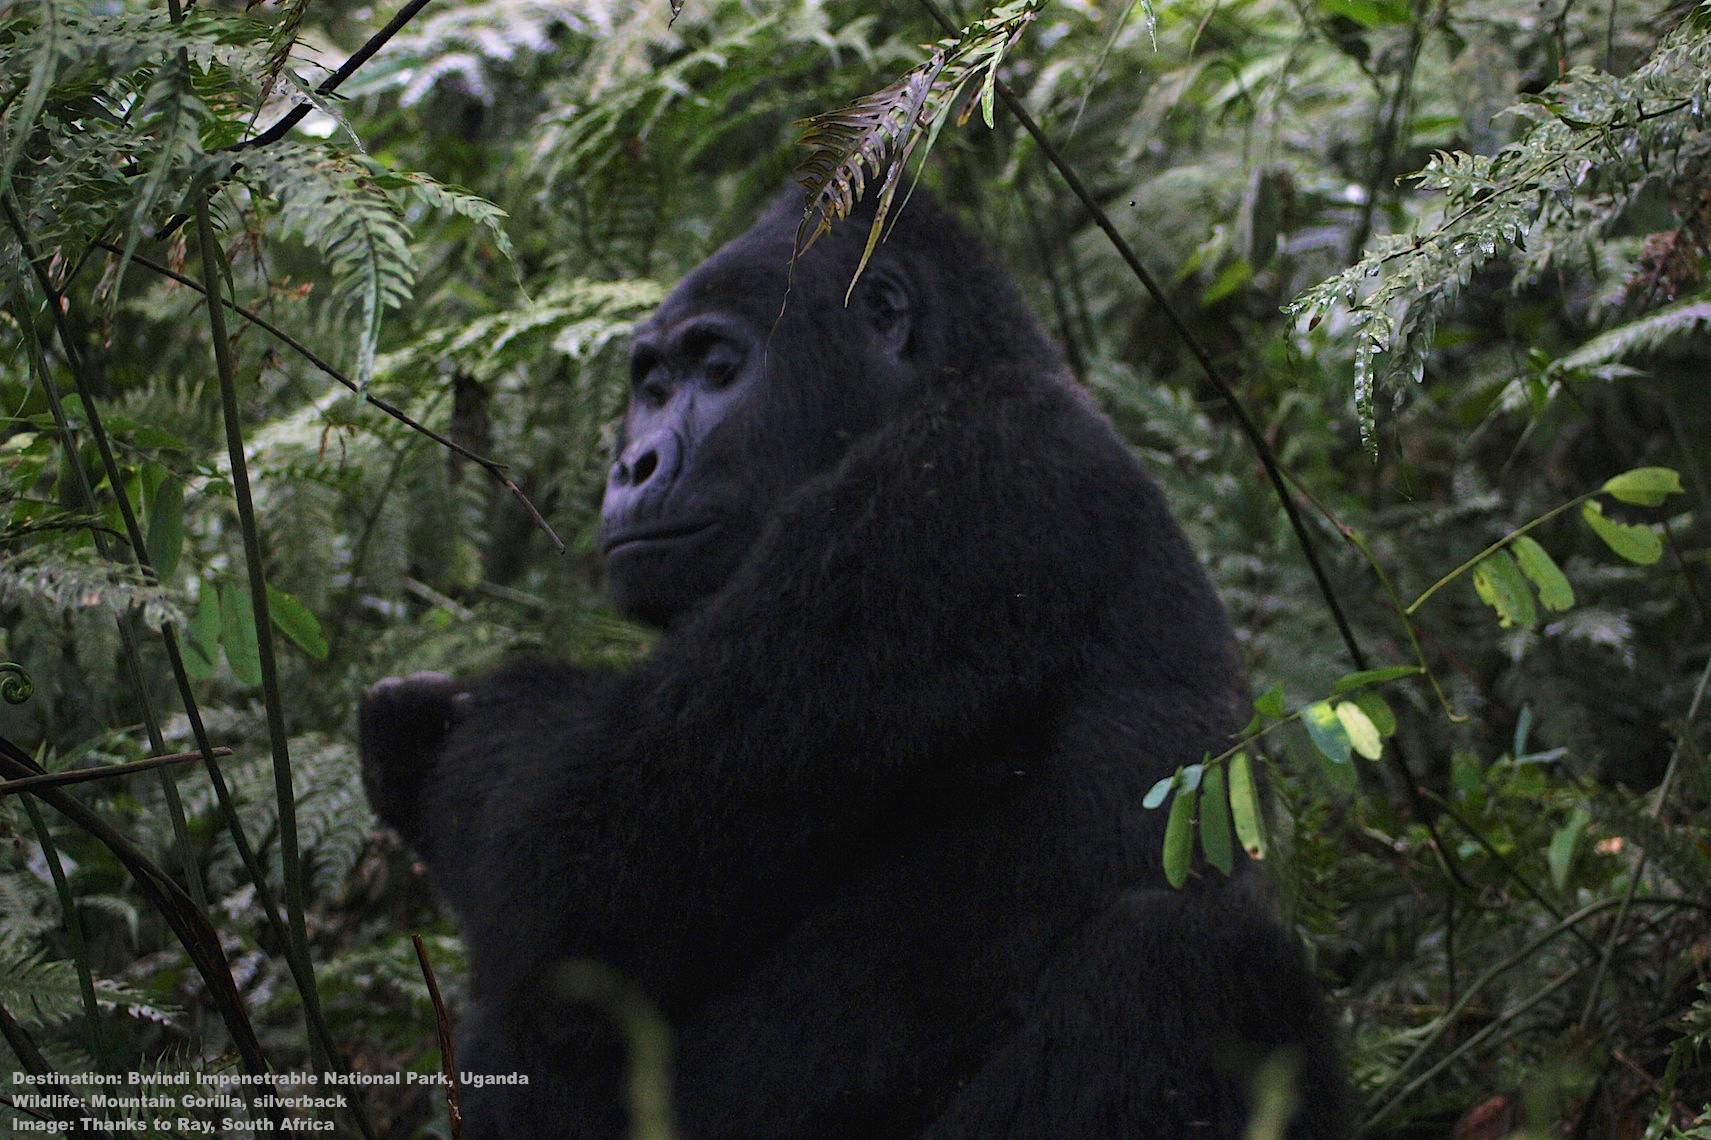 Bwindi-Impenetrable-forest-national-park-uganda-mountain-gorilla-HRC.jpg